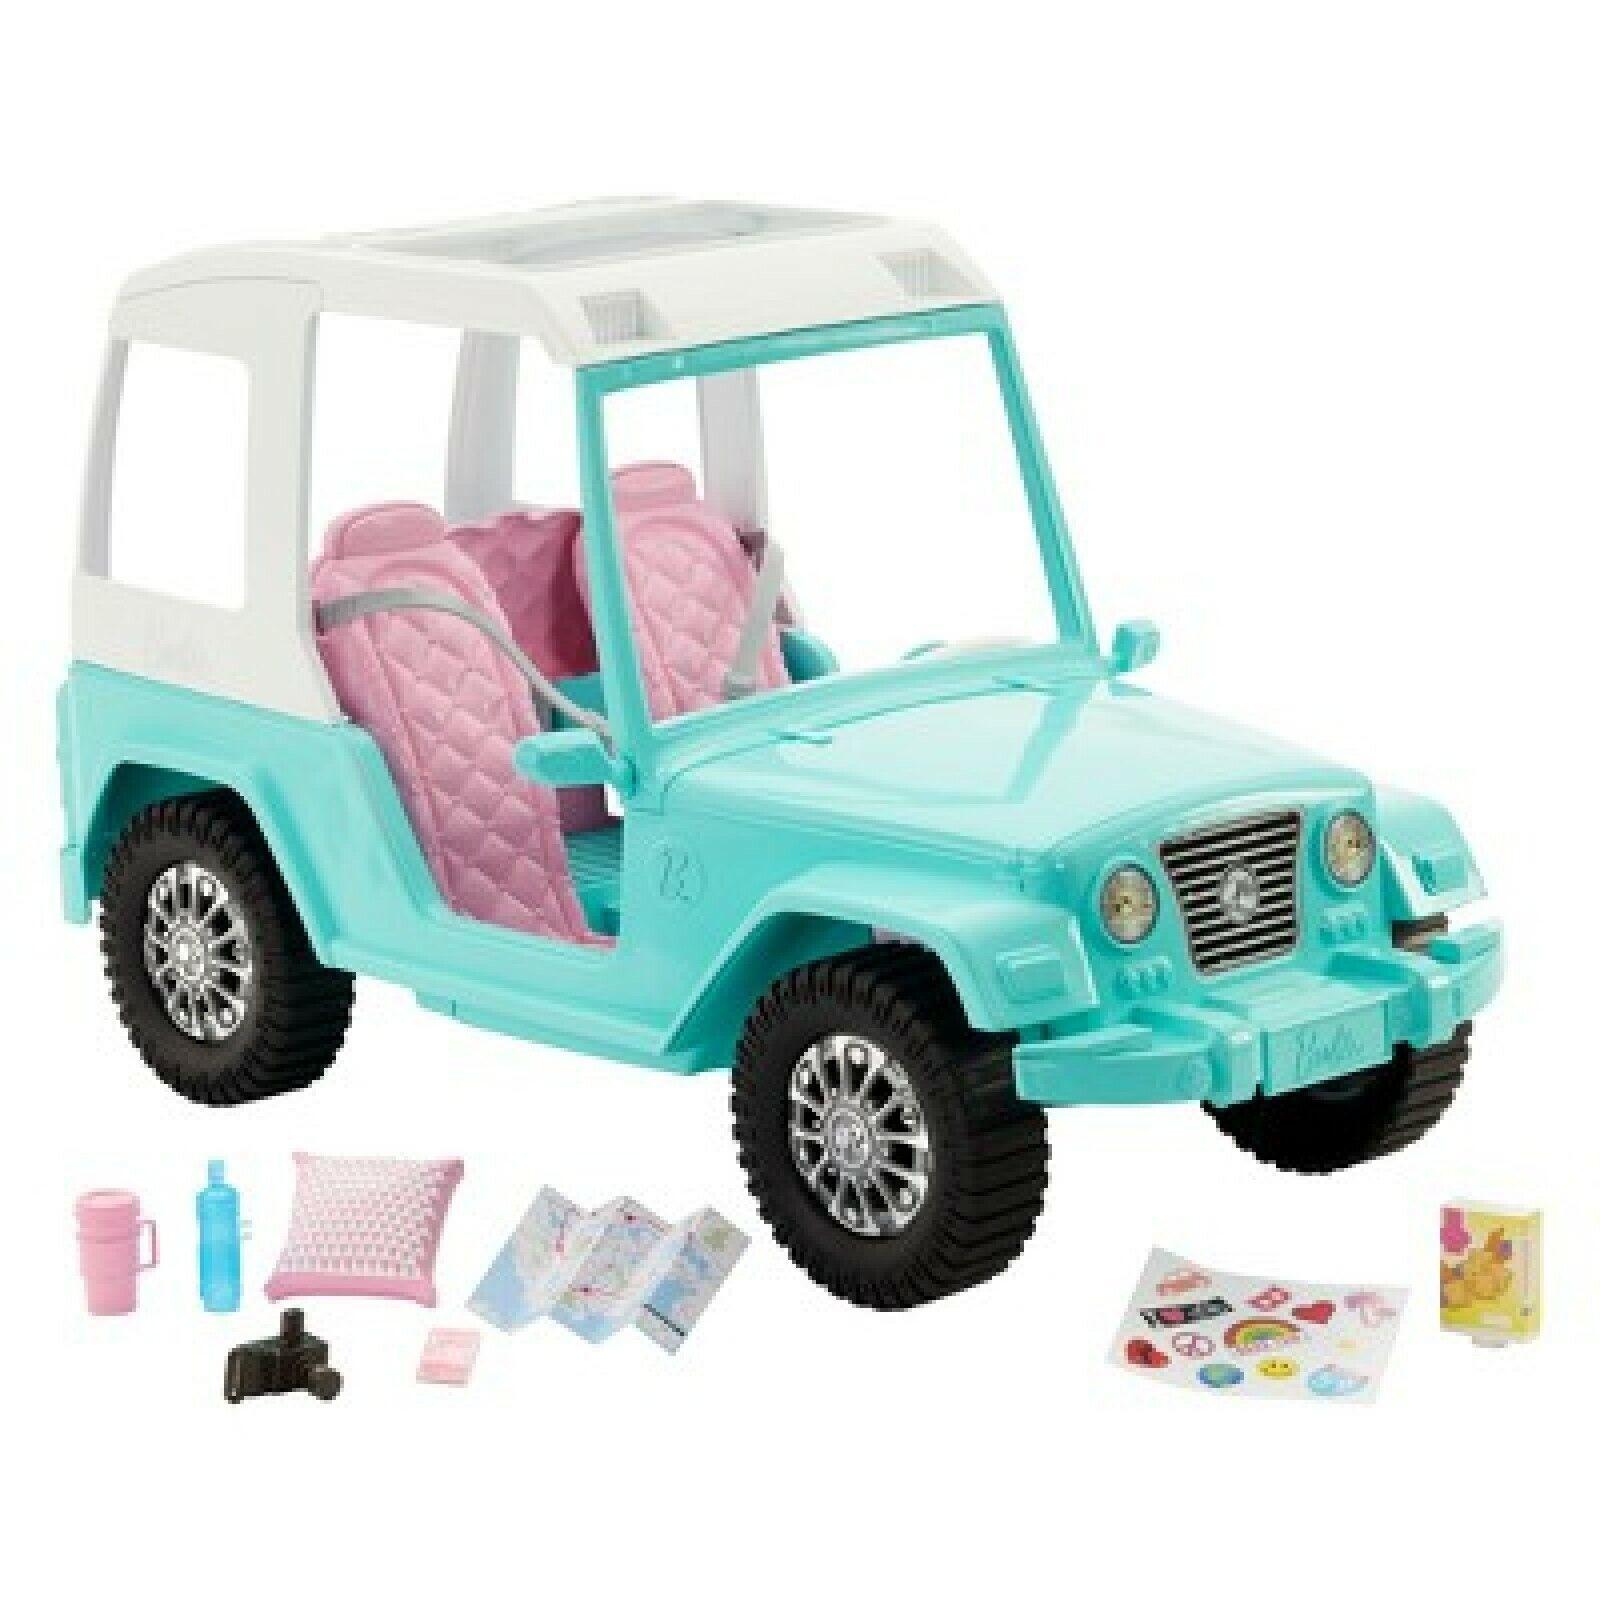 Barbie Pink Passport Jeep Vehicle Kid Toy Gift